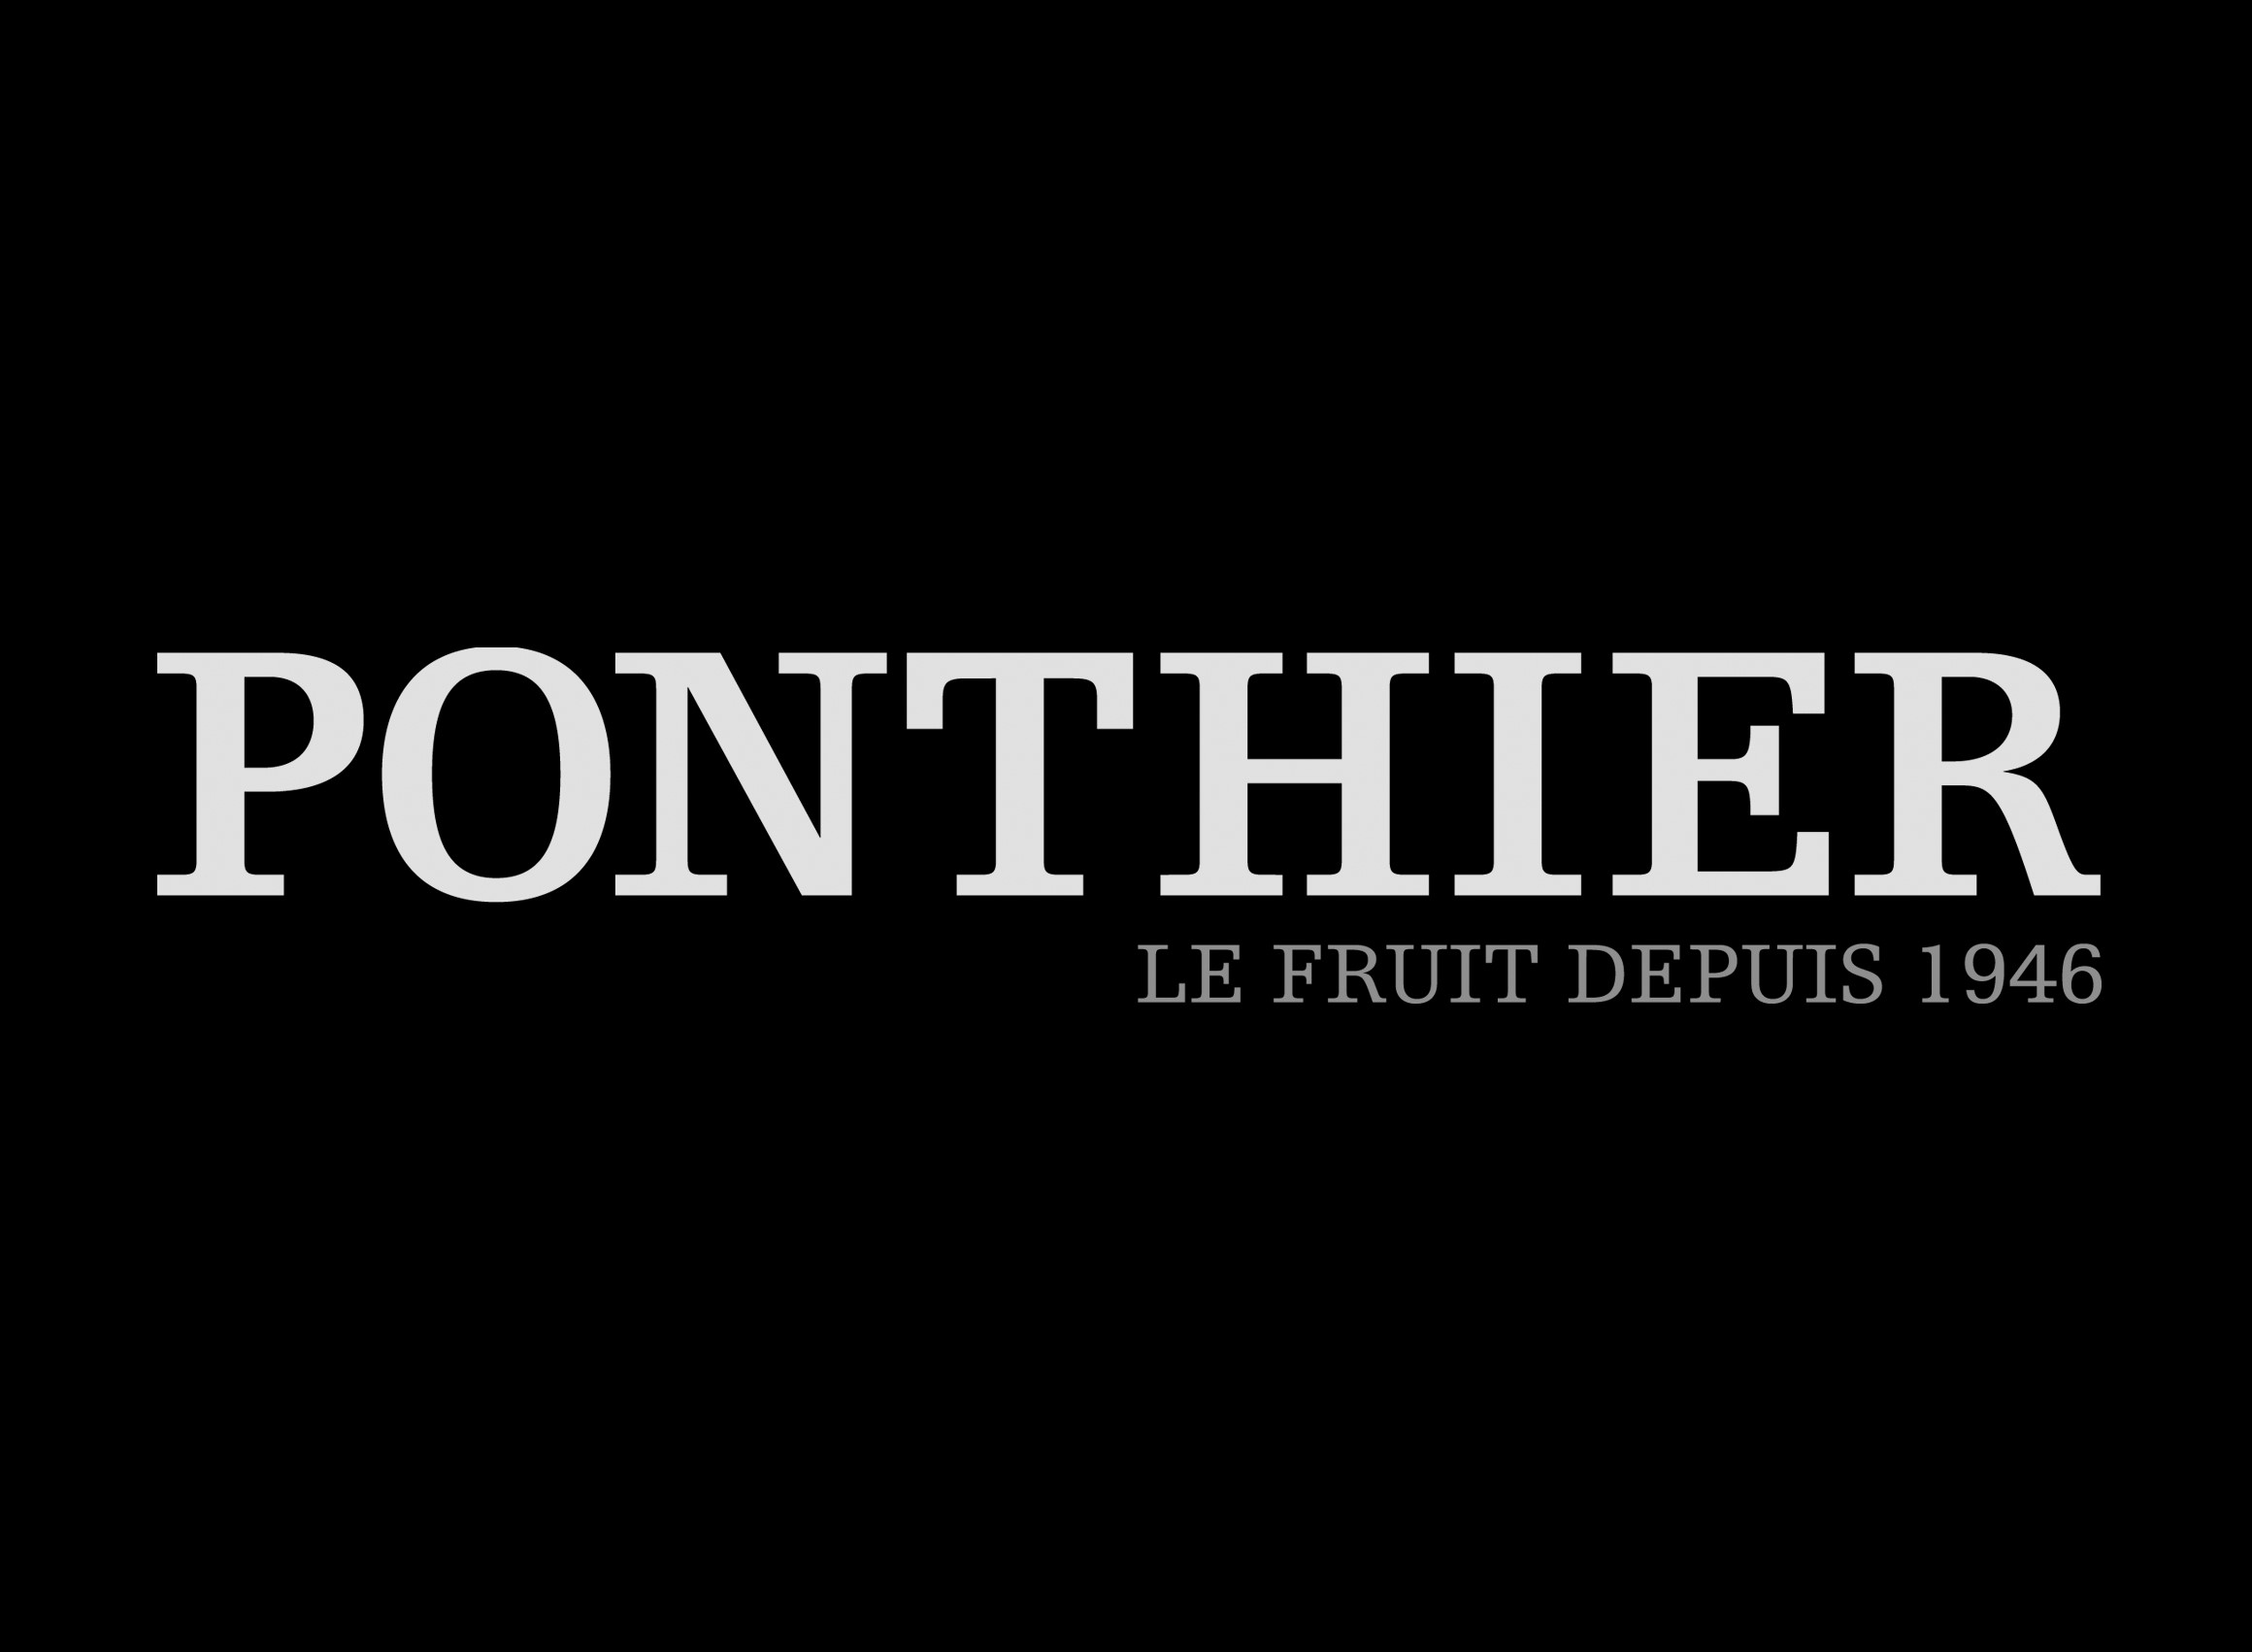 PONTHIER